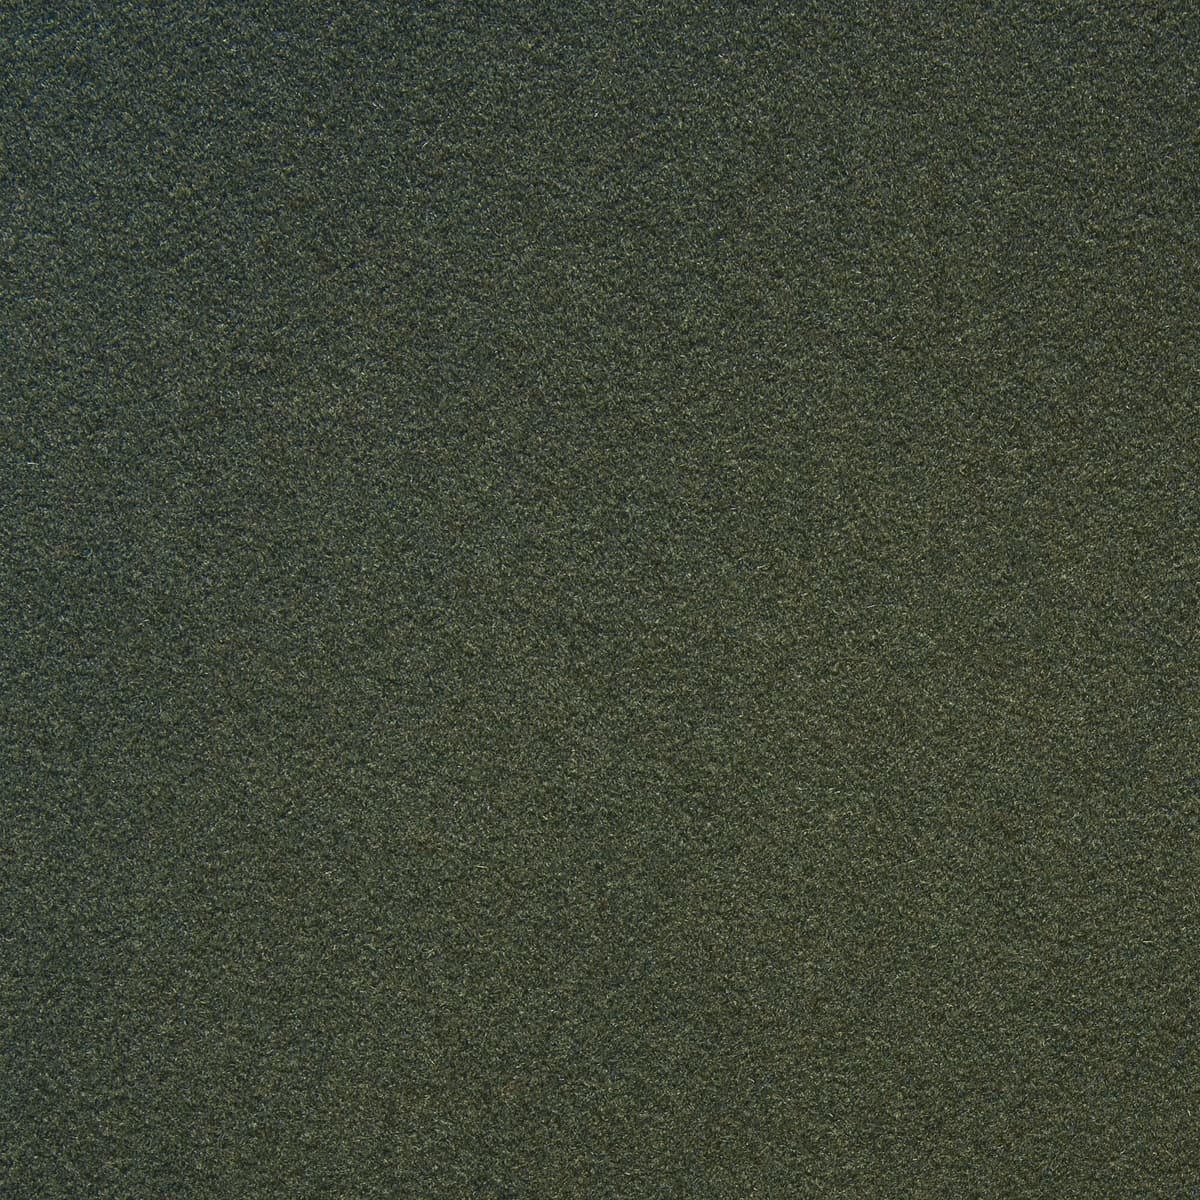 FWP101 03 Detail